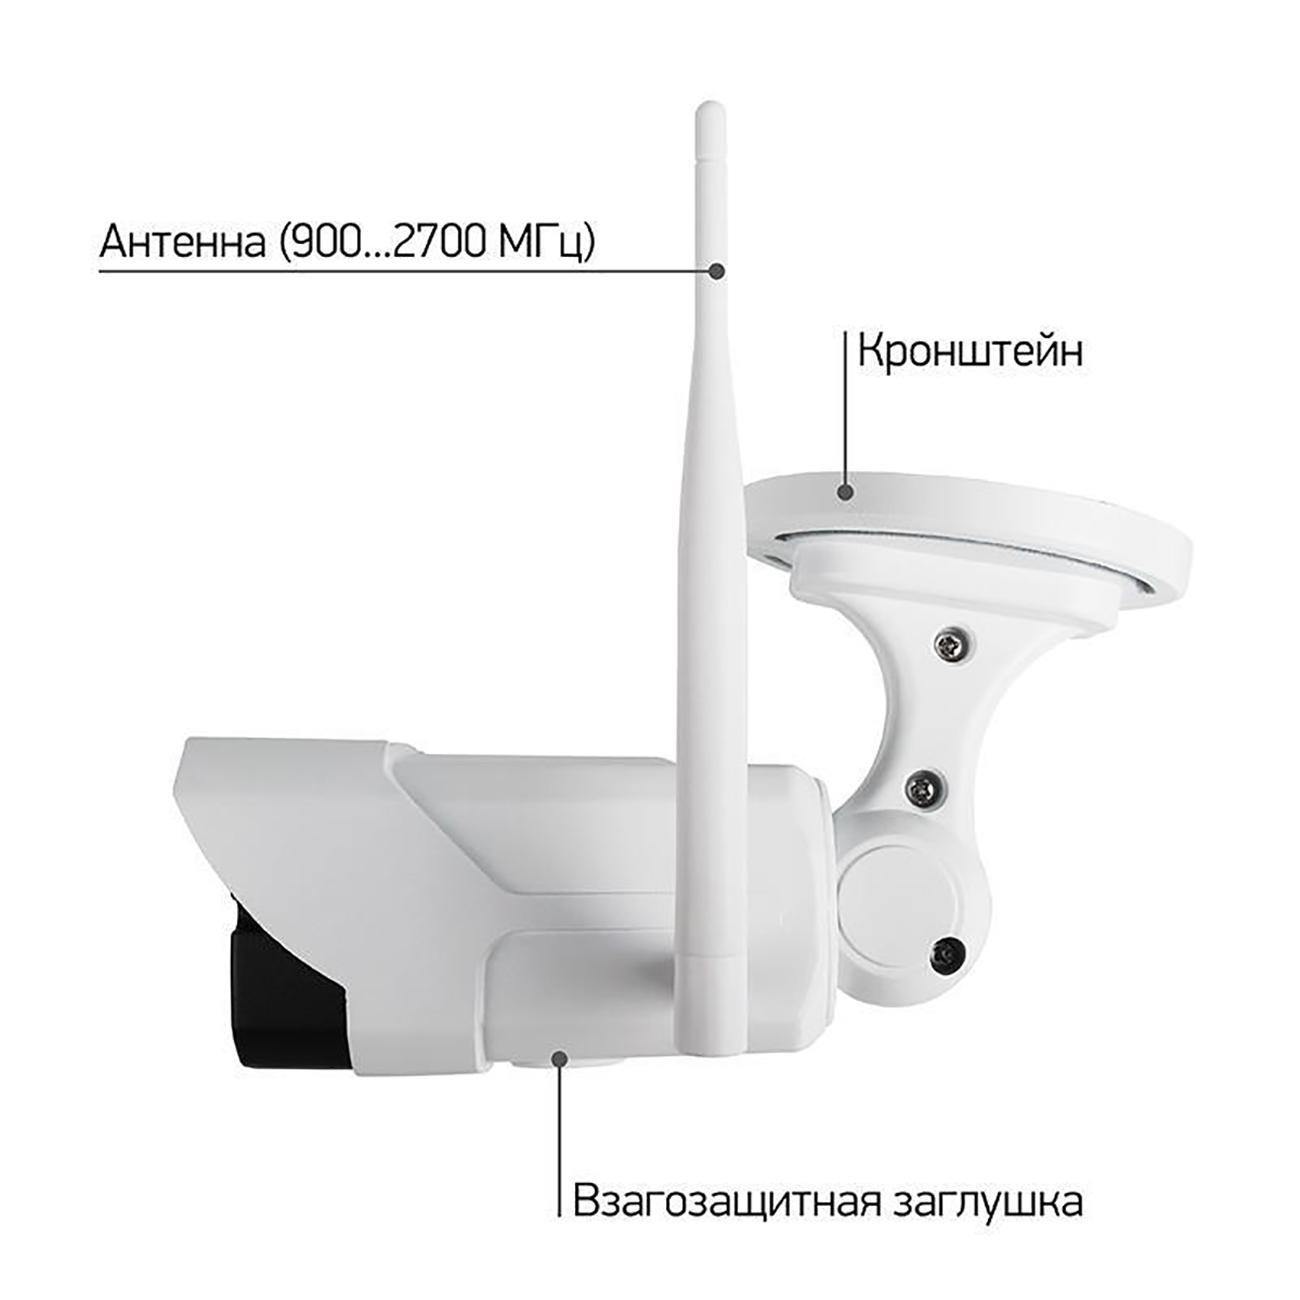 Фото Беспроводная уличная 4G (LTE) Smart камера Rexant {45-0270} (2)